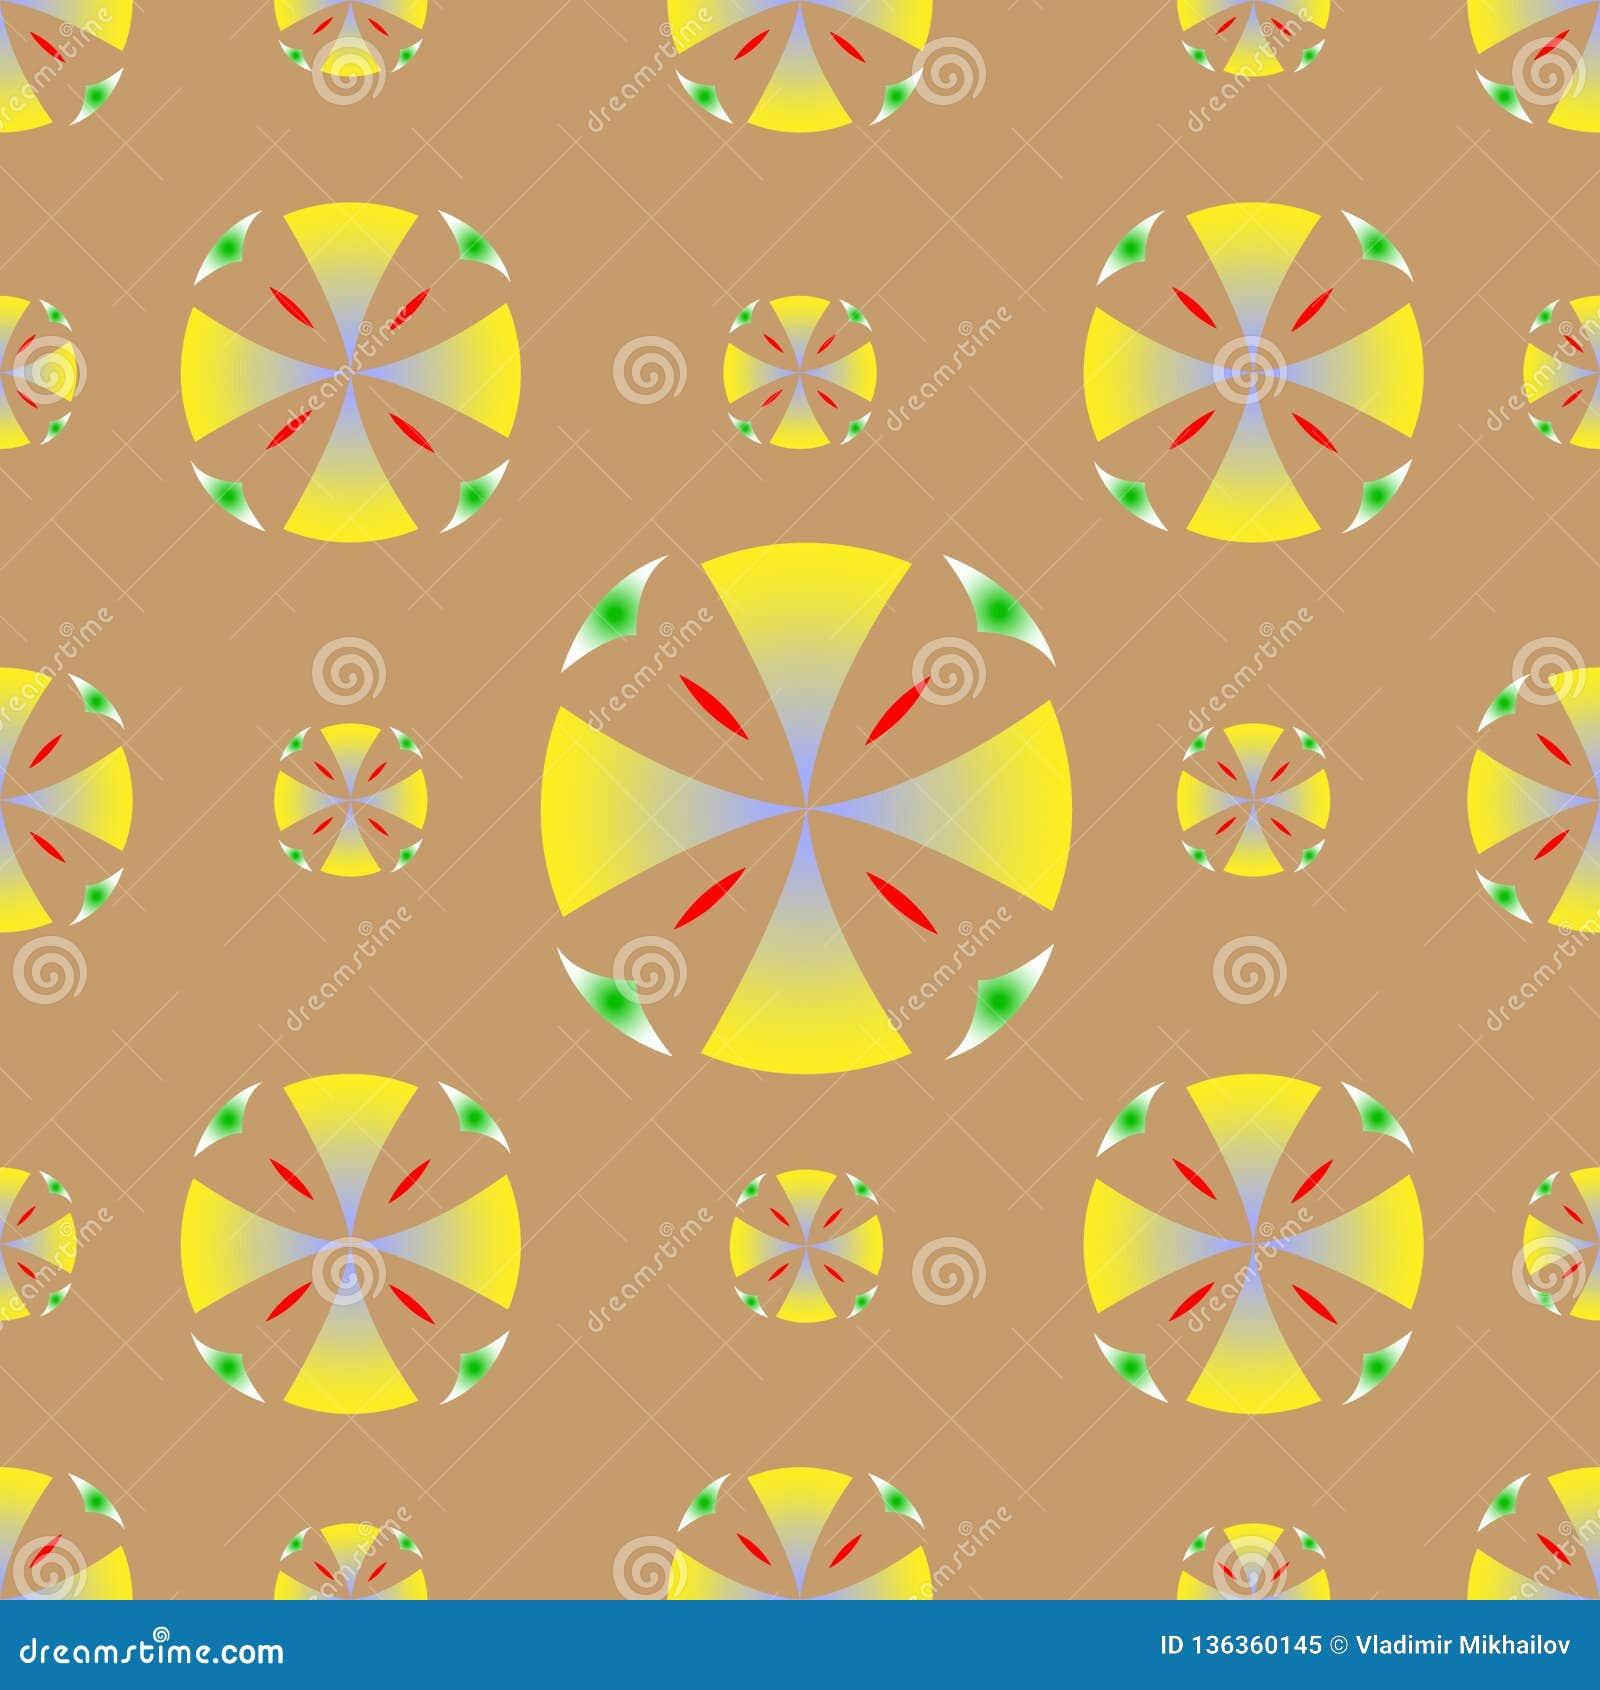 Вектор предпосылки кругов безшовной текстуры желтый